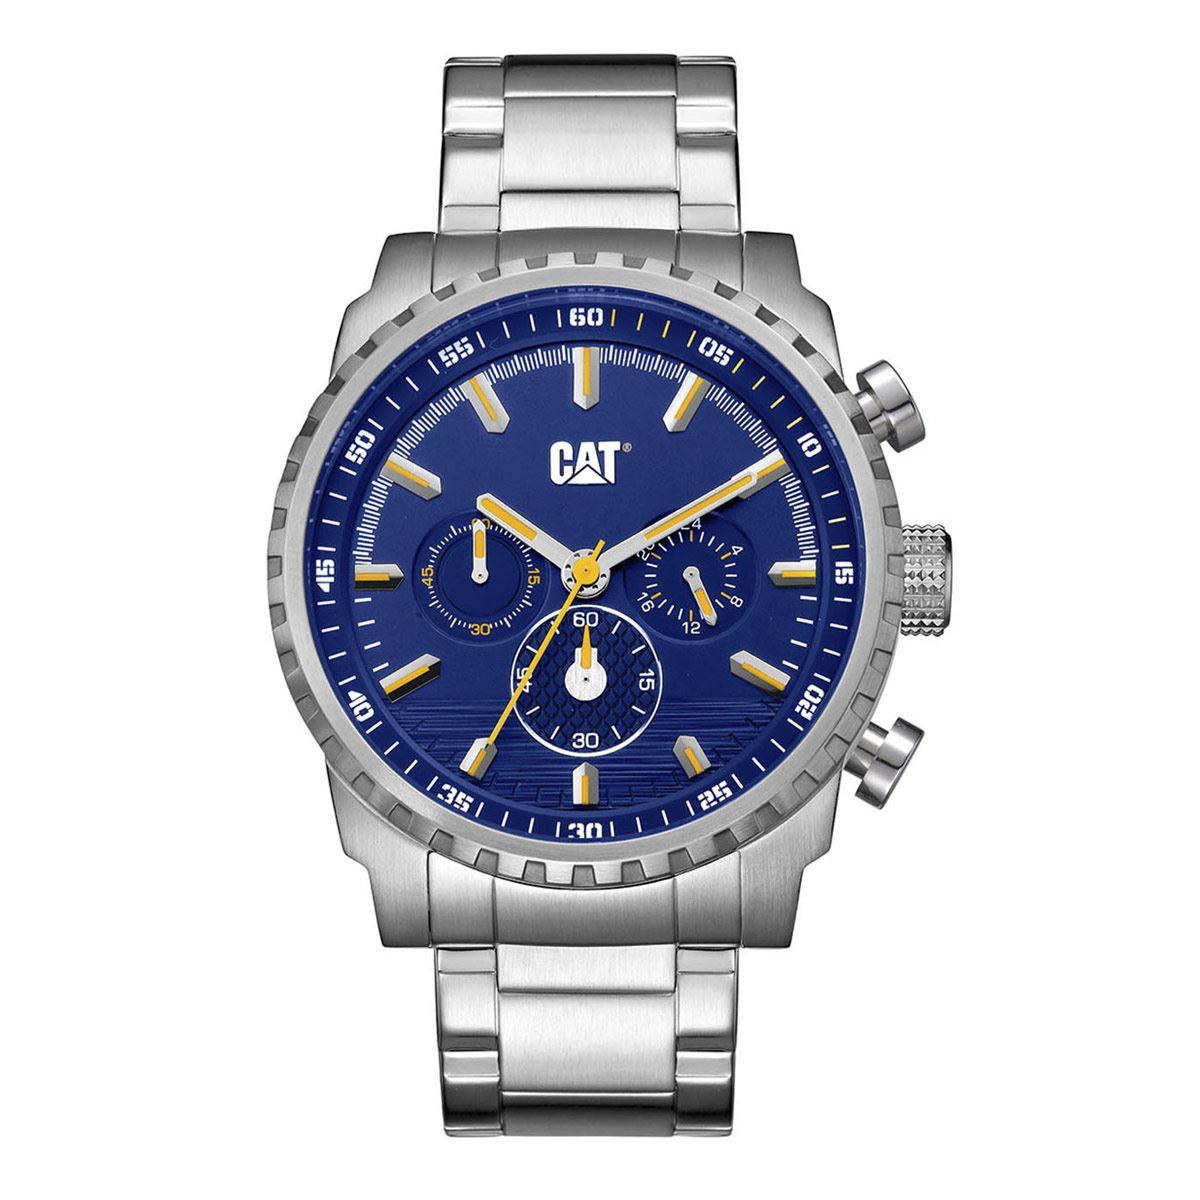 Reloj Caterpillar para Caballero Carátula Azul